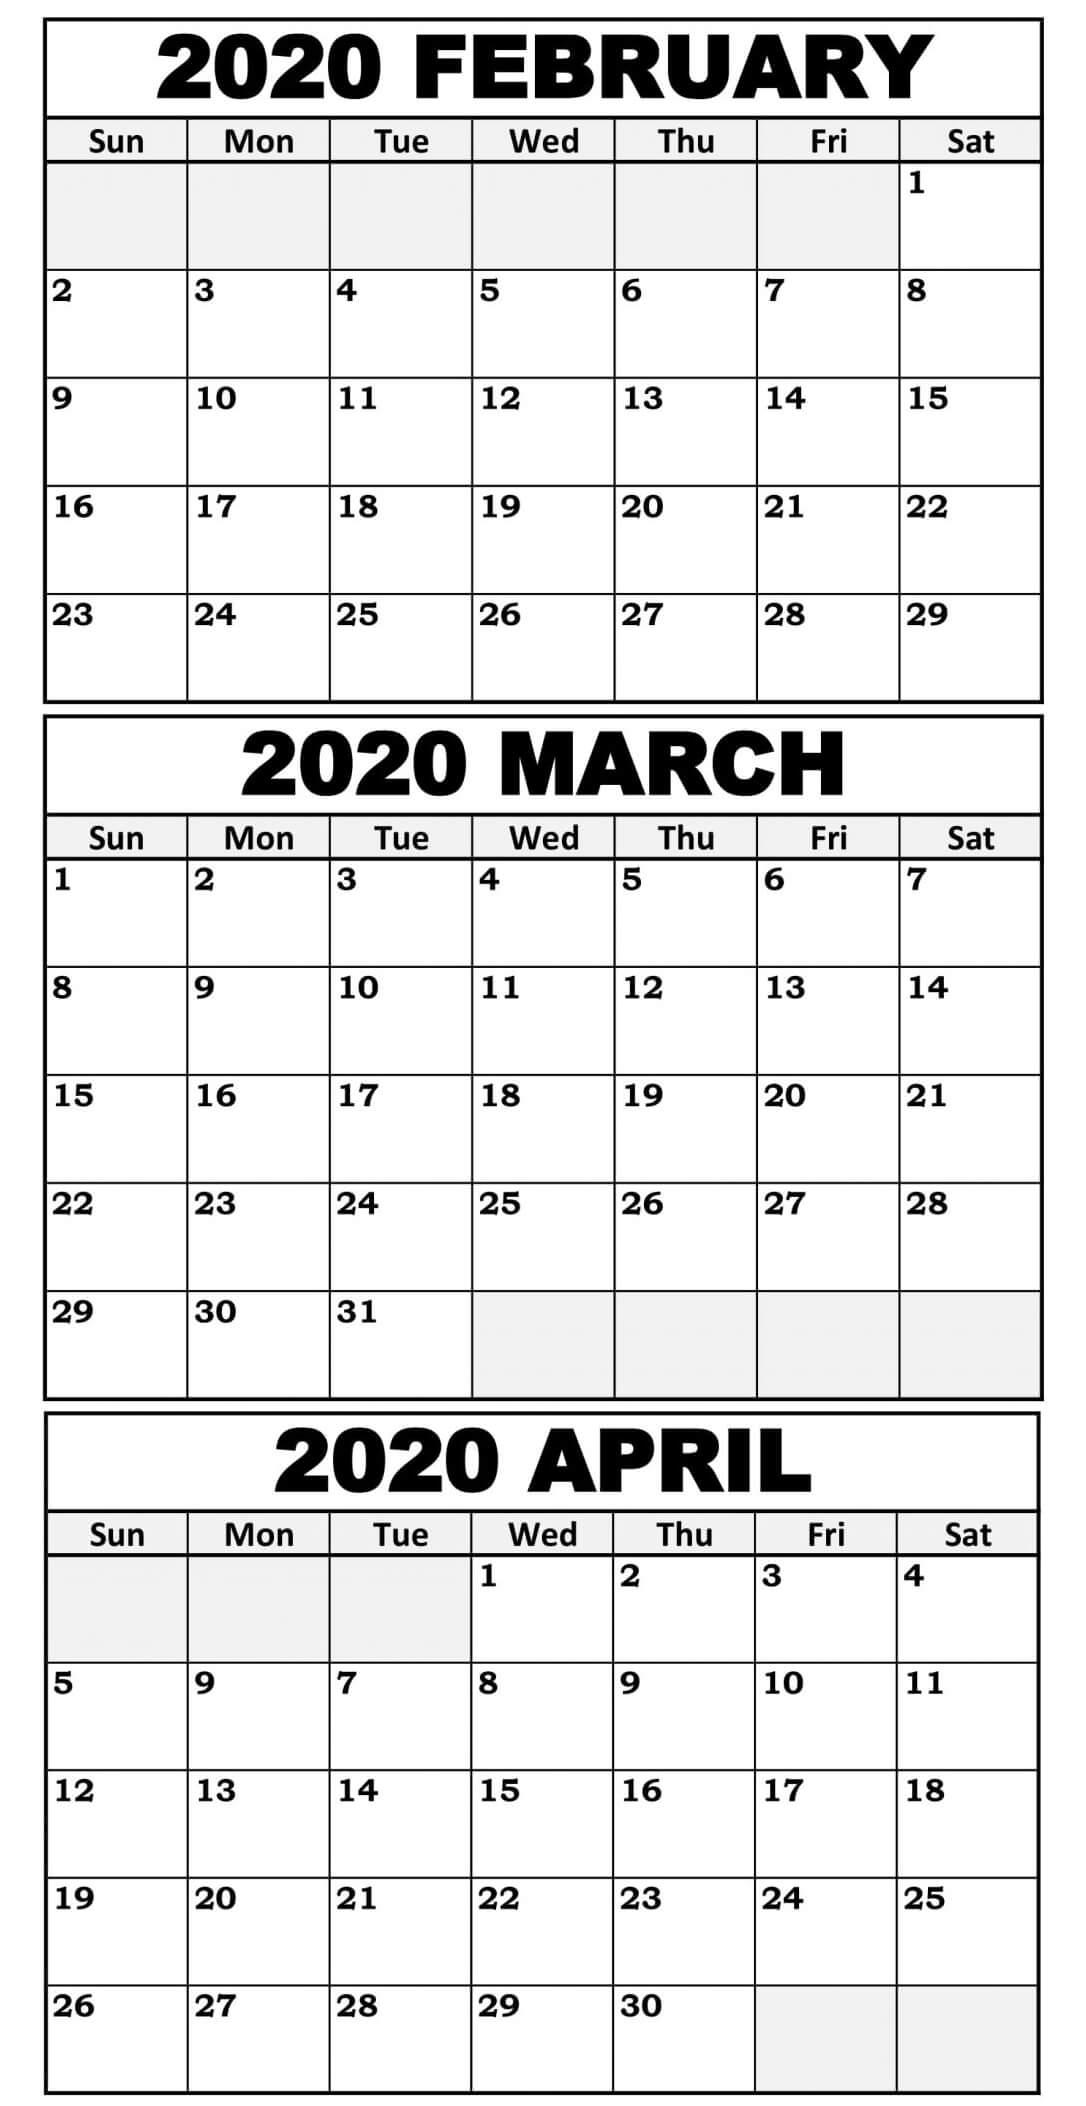 February To April 2020 Calendar With Holidays - 2019